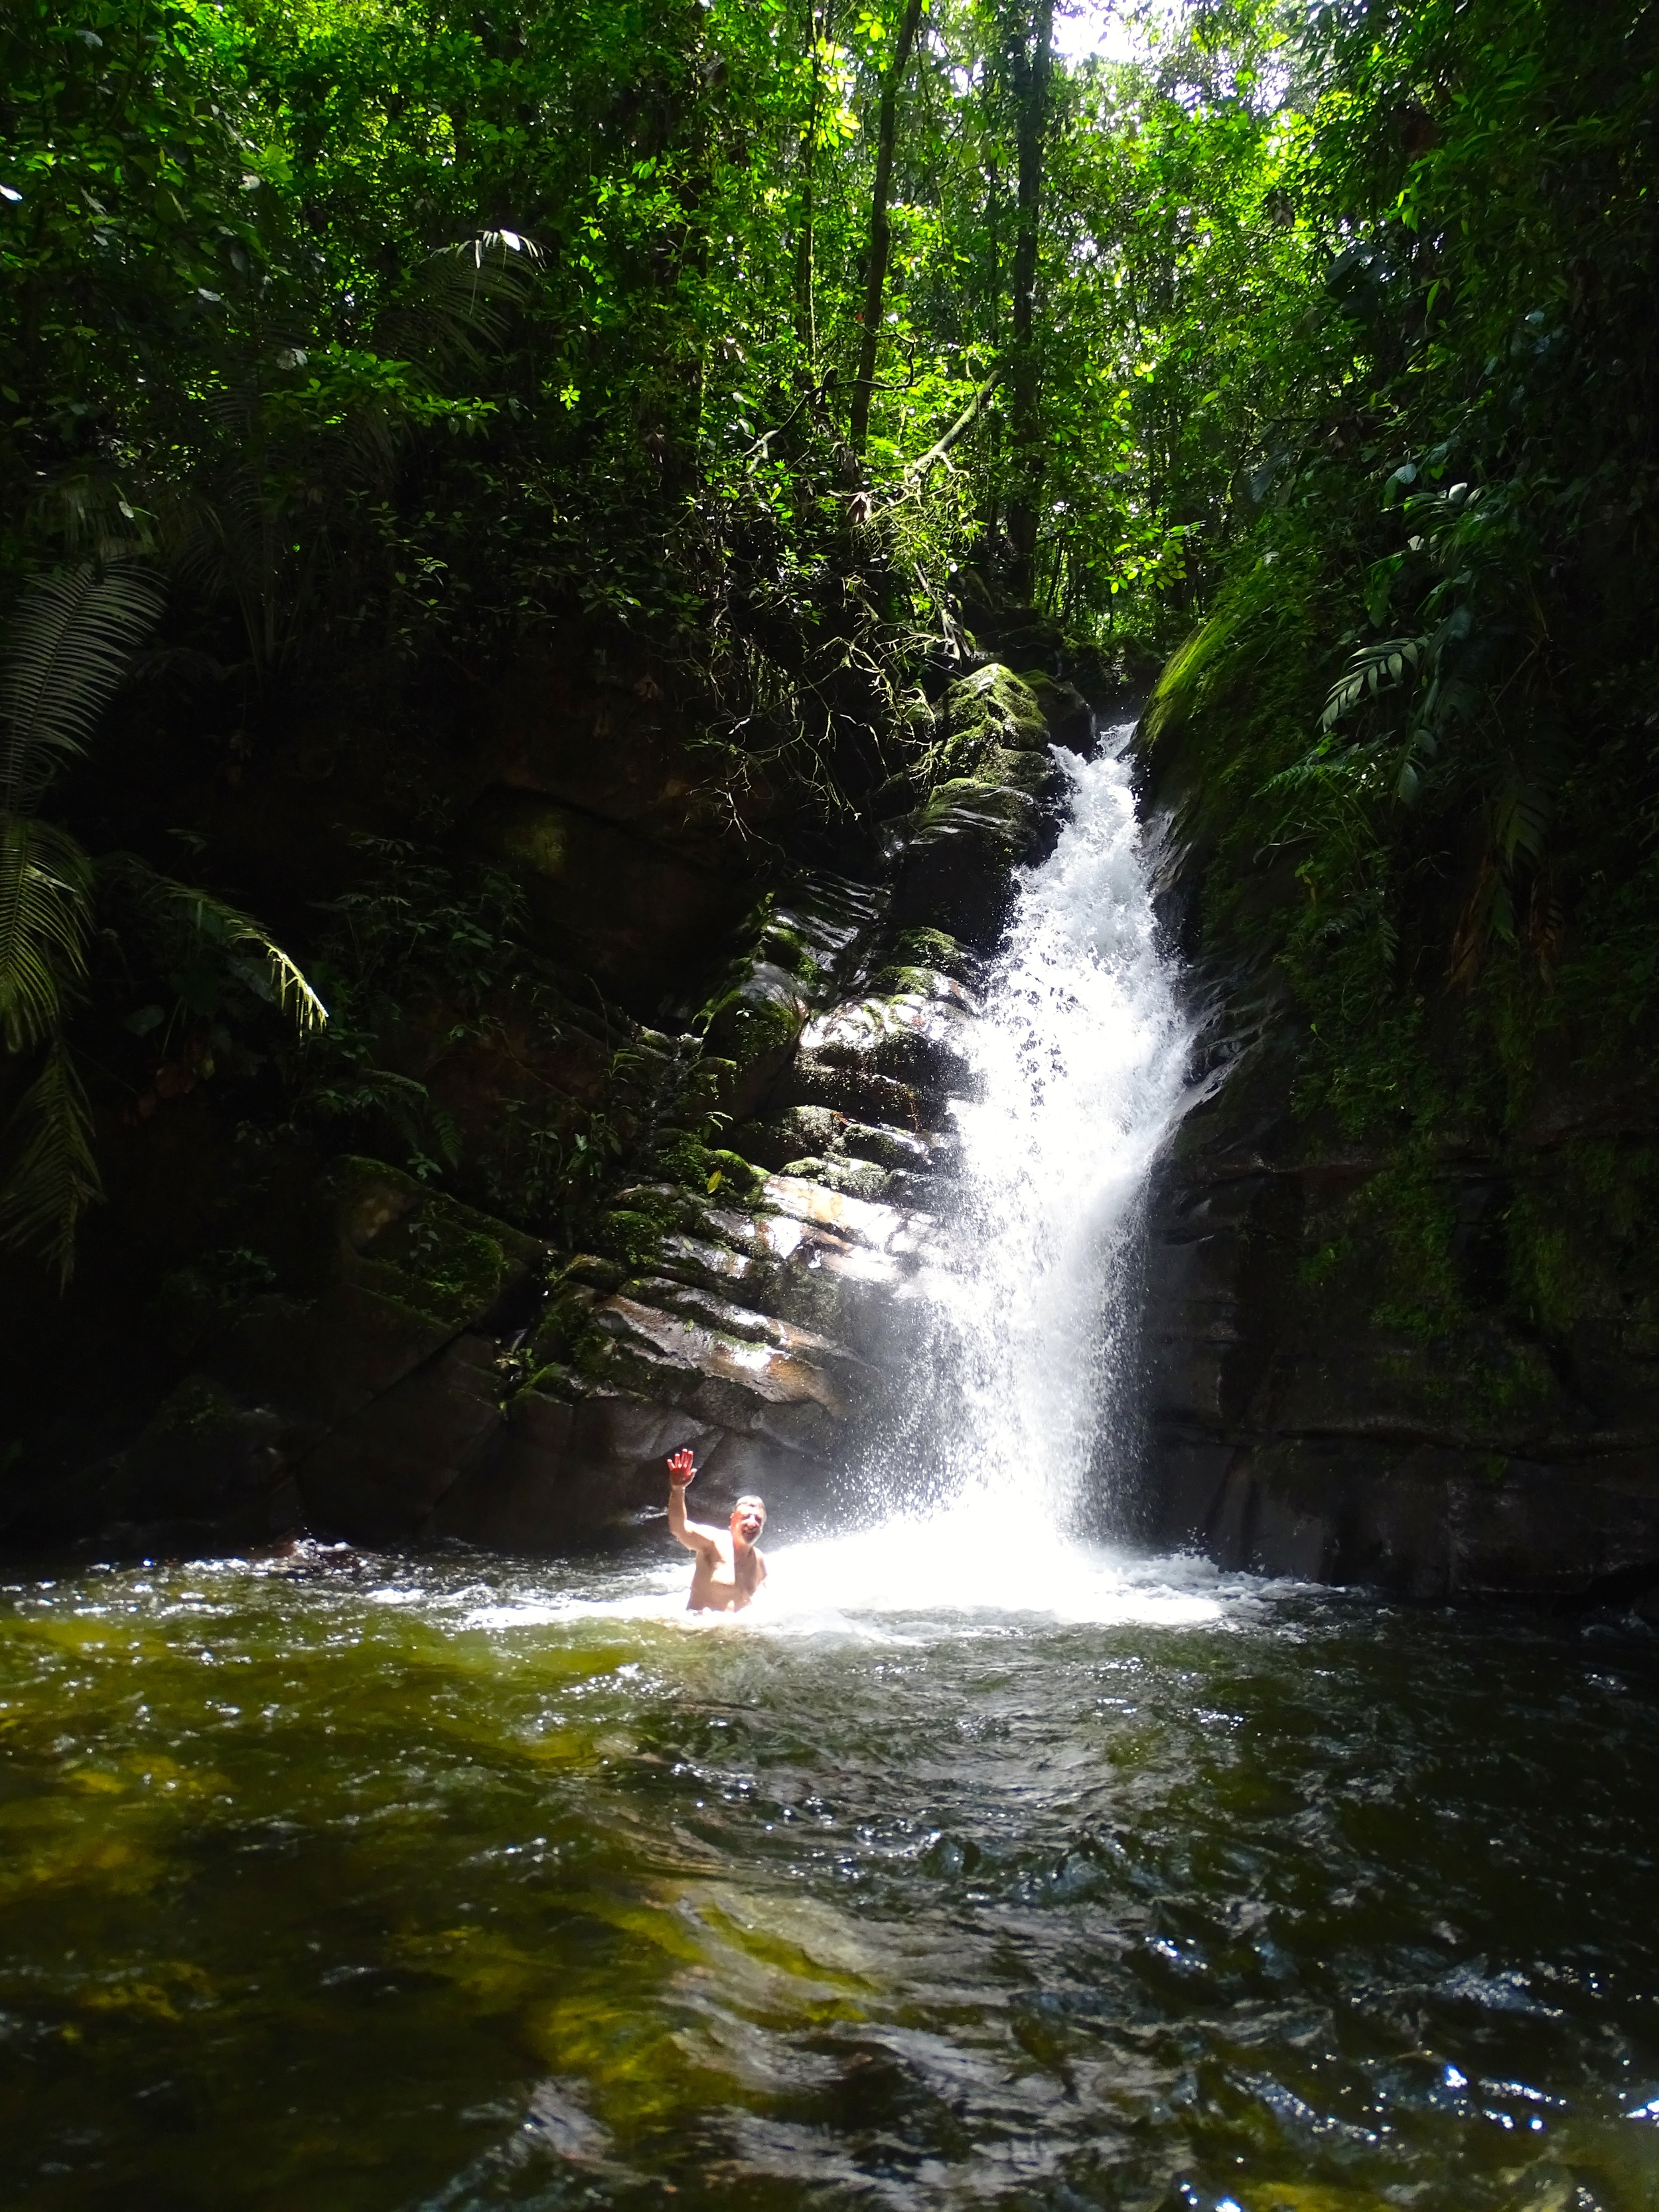 The reward was a dip near the waterfalls. Sweet!